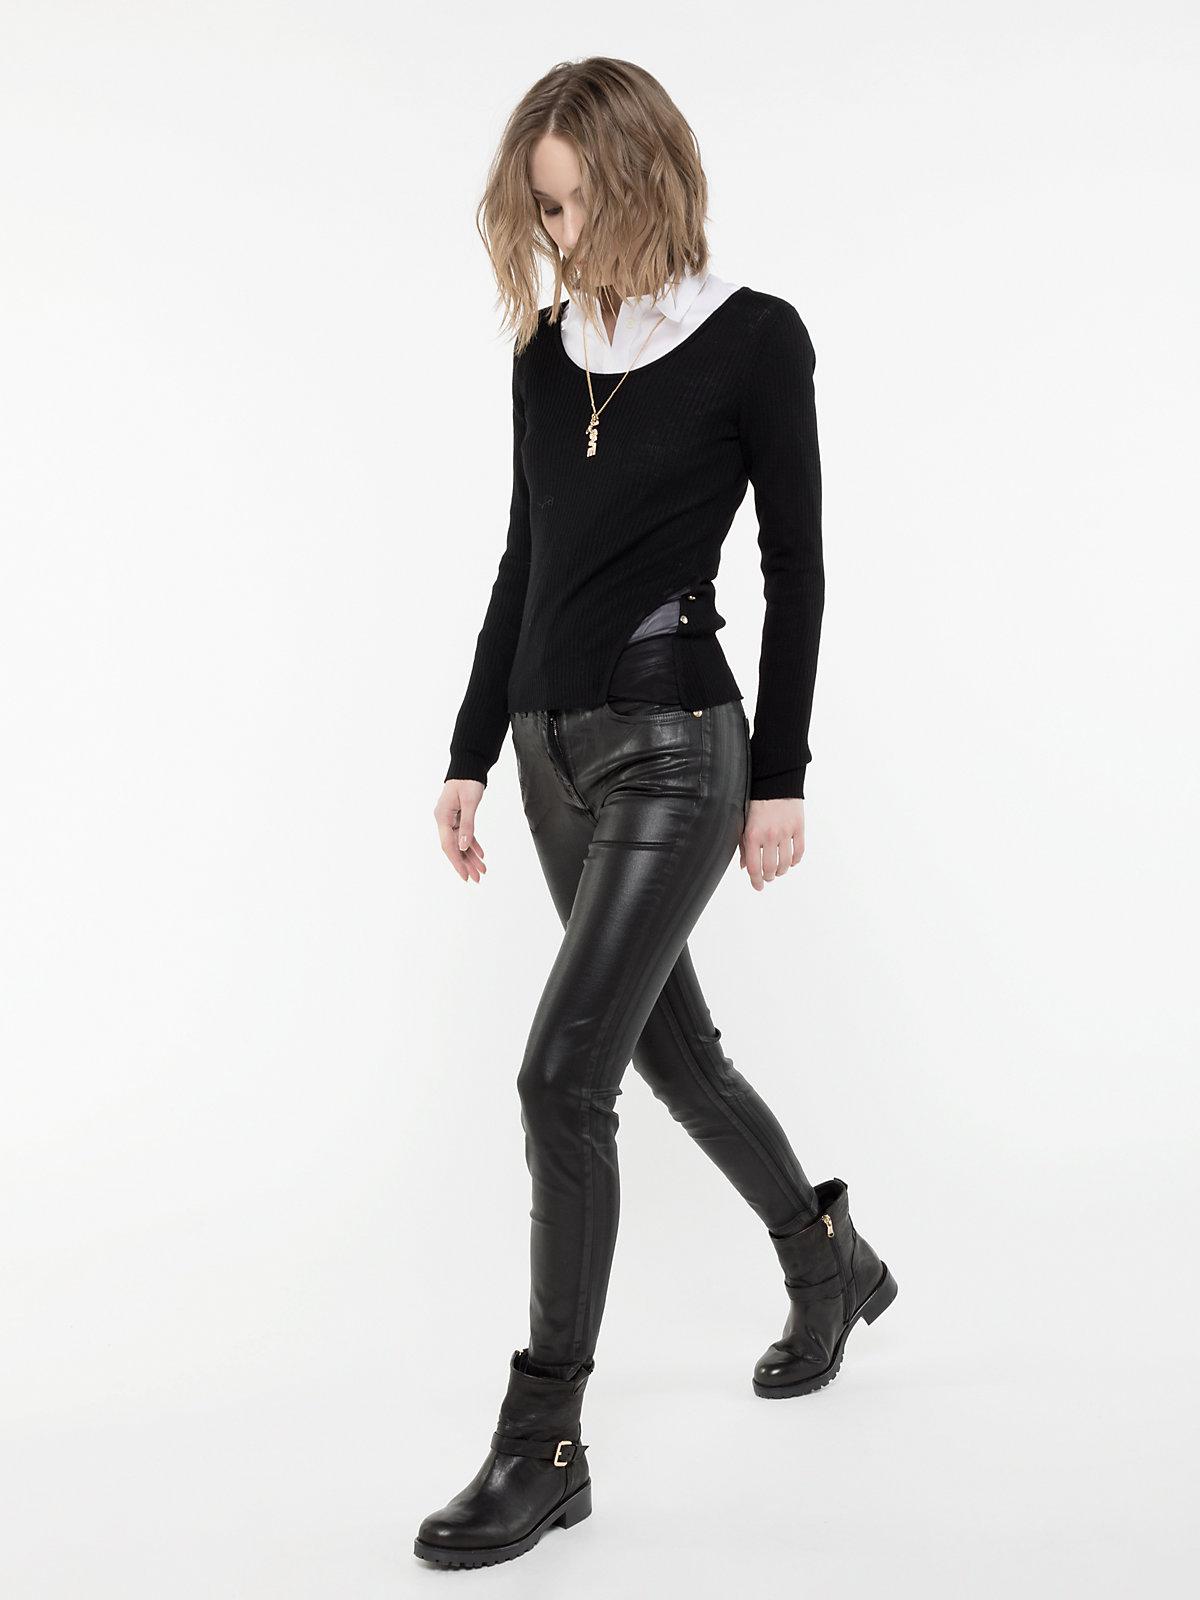 Pantaloni di pelle Patrizia Pepe a 218 euro